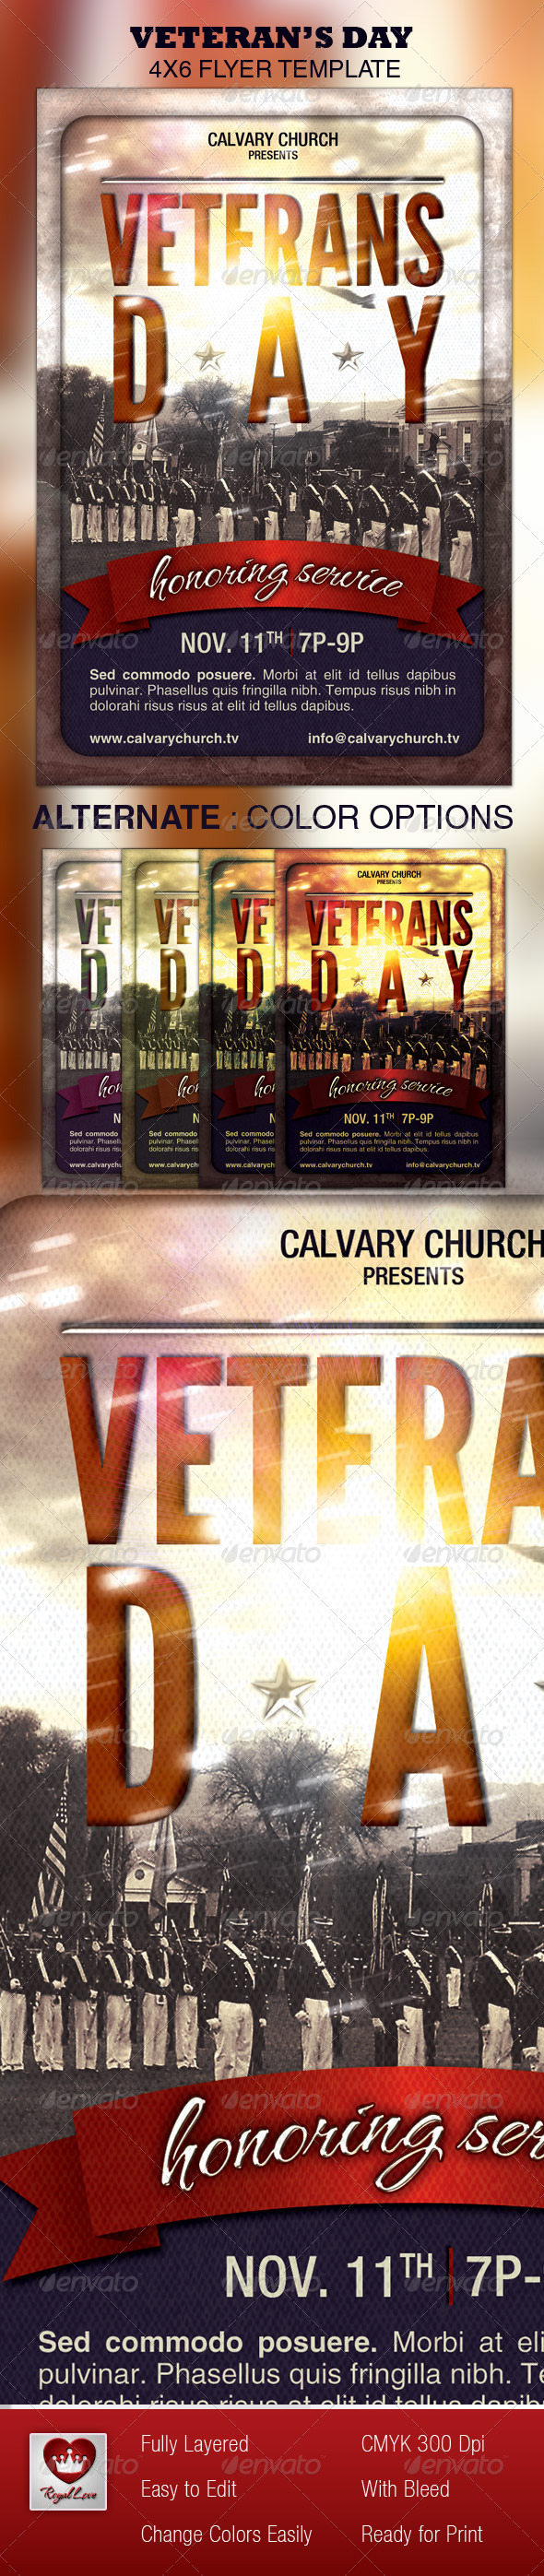 Veterans Day Church Flyer